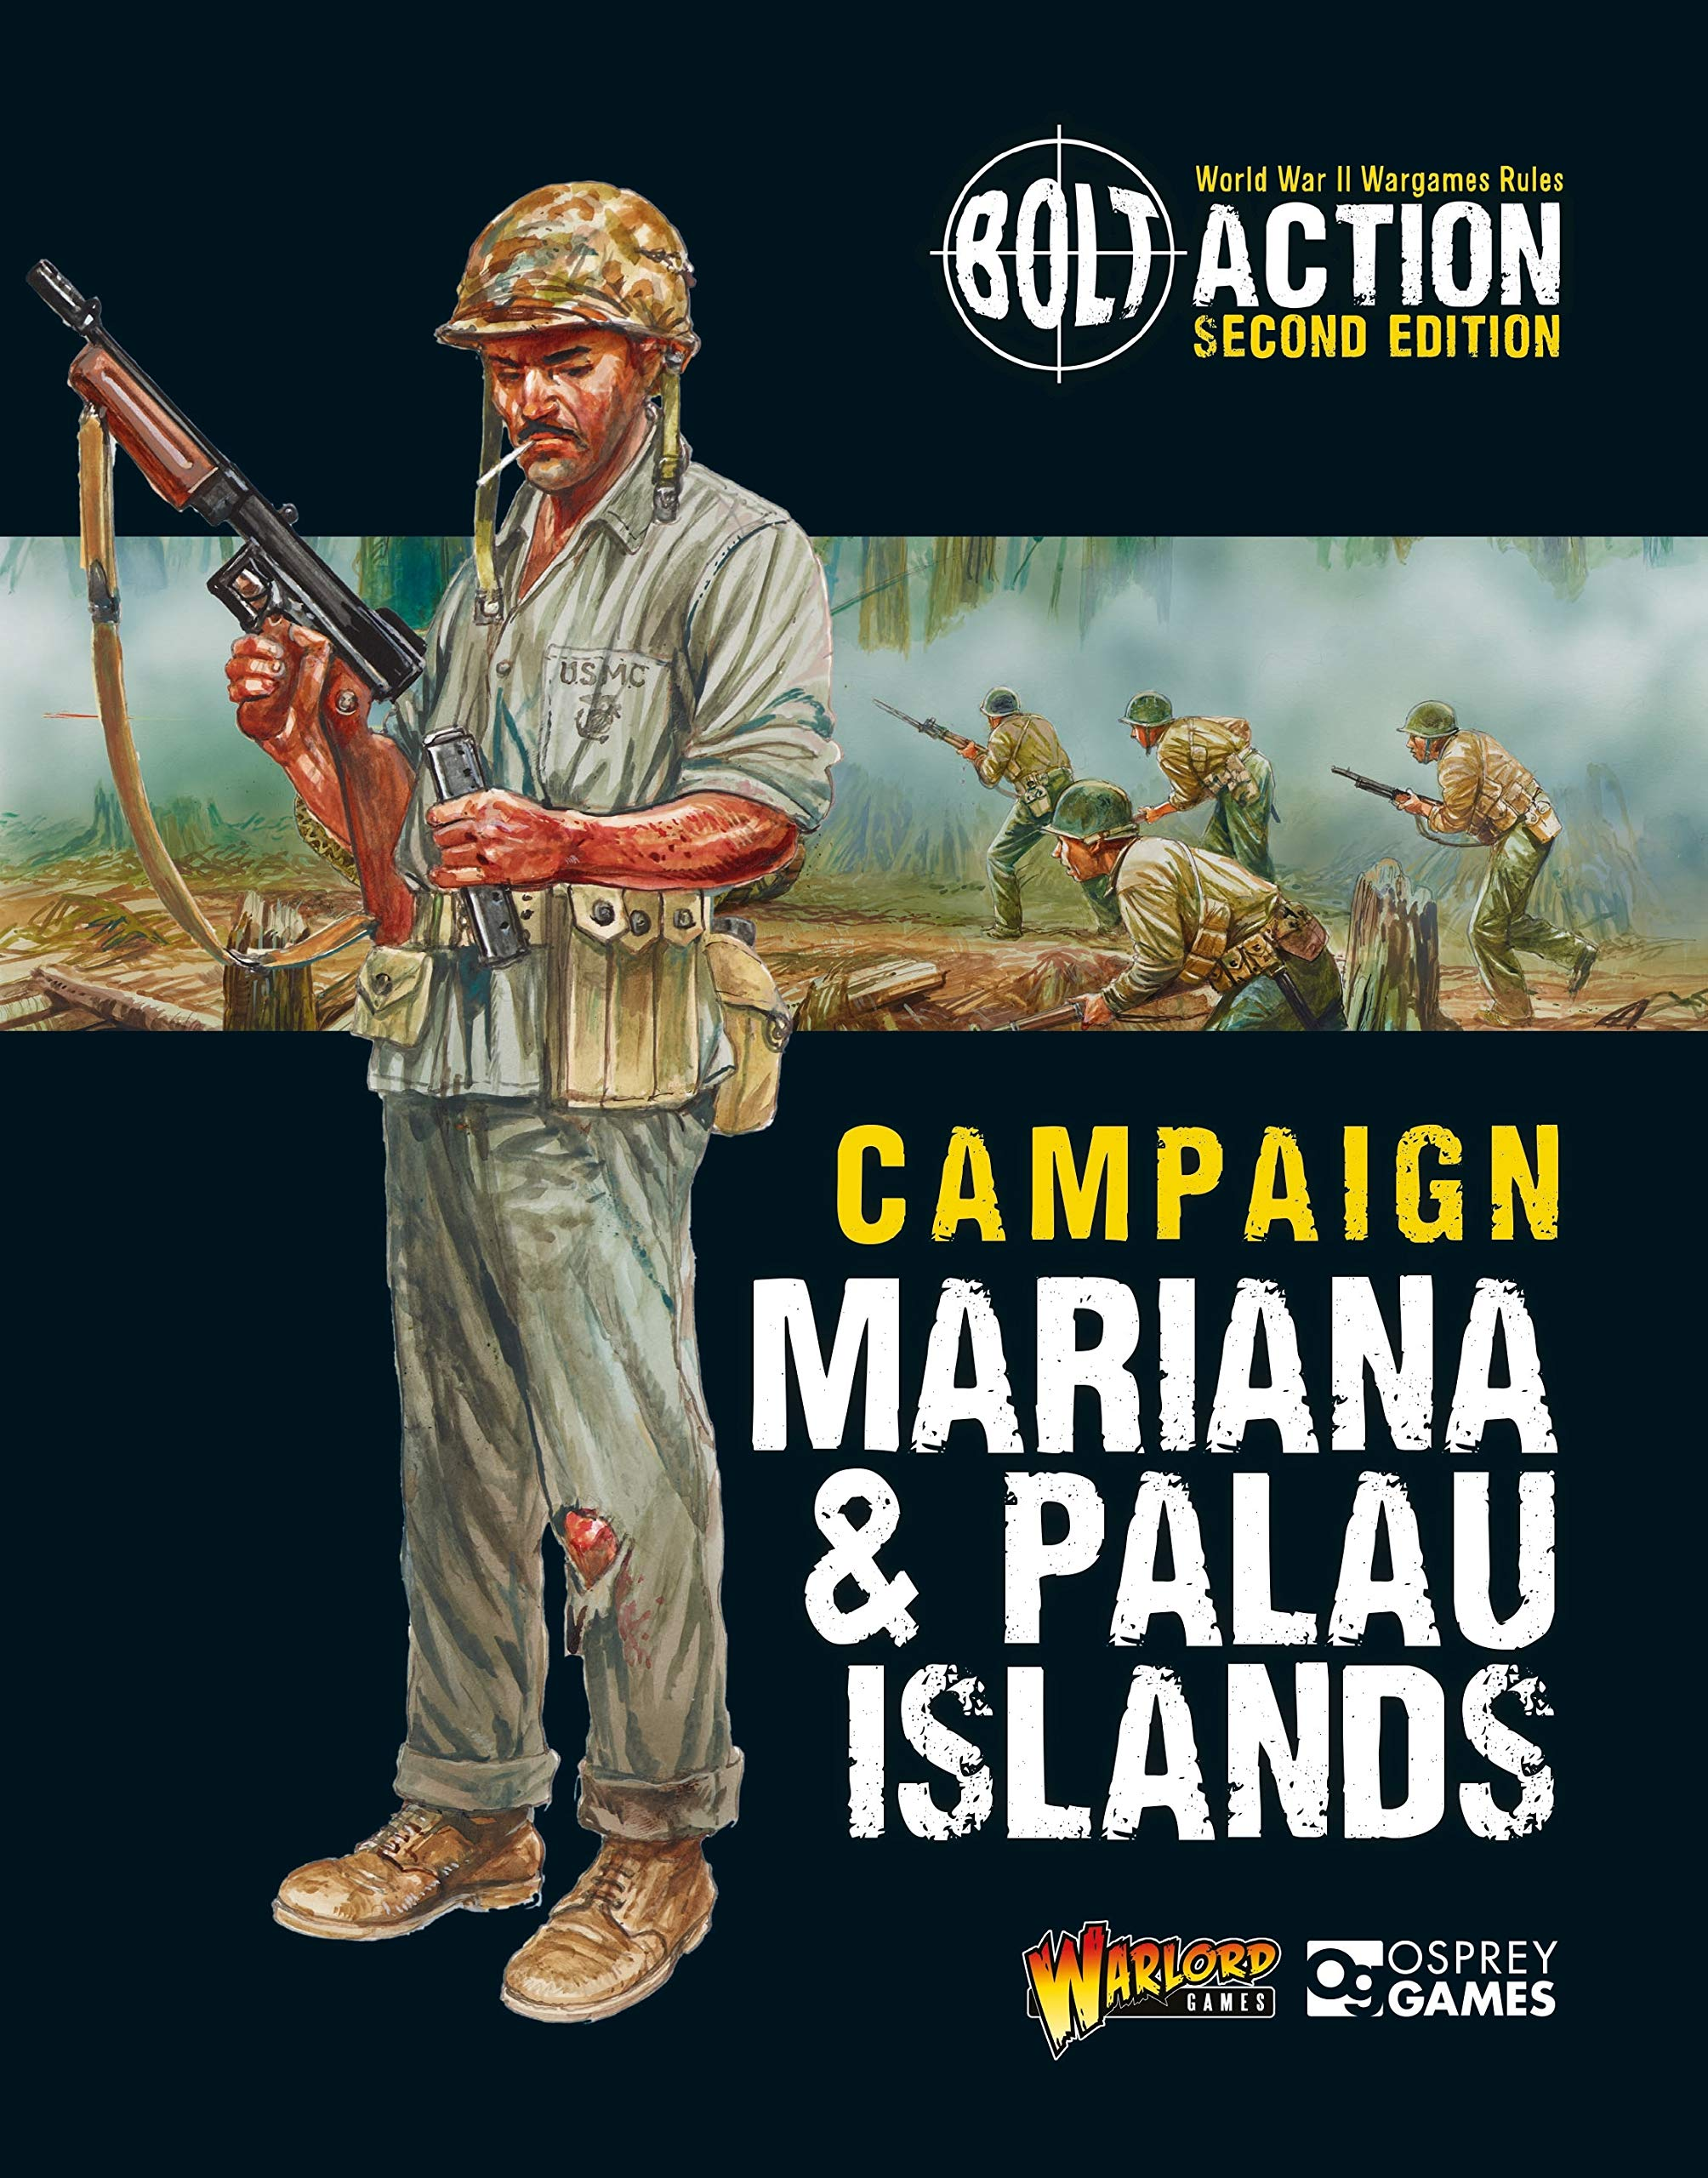 Day 4 - Mariana Campaign